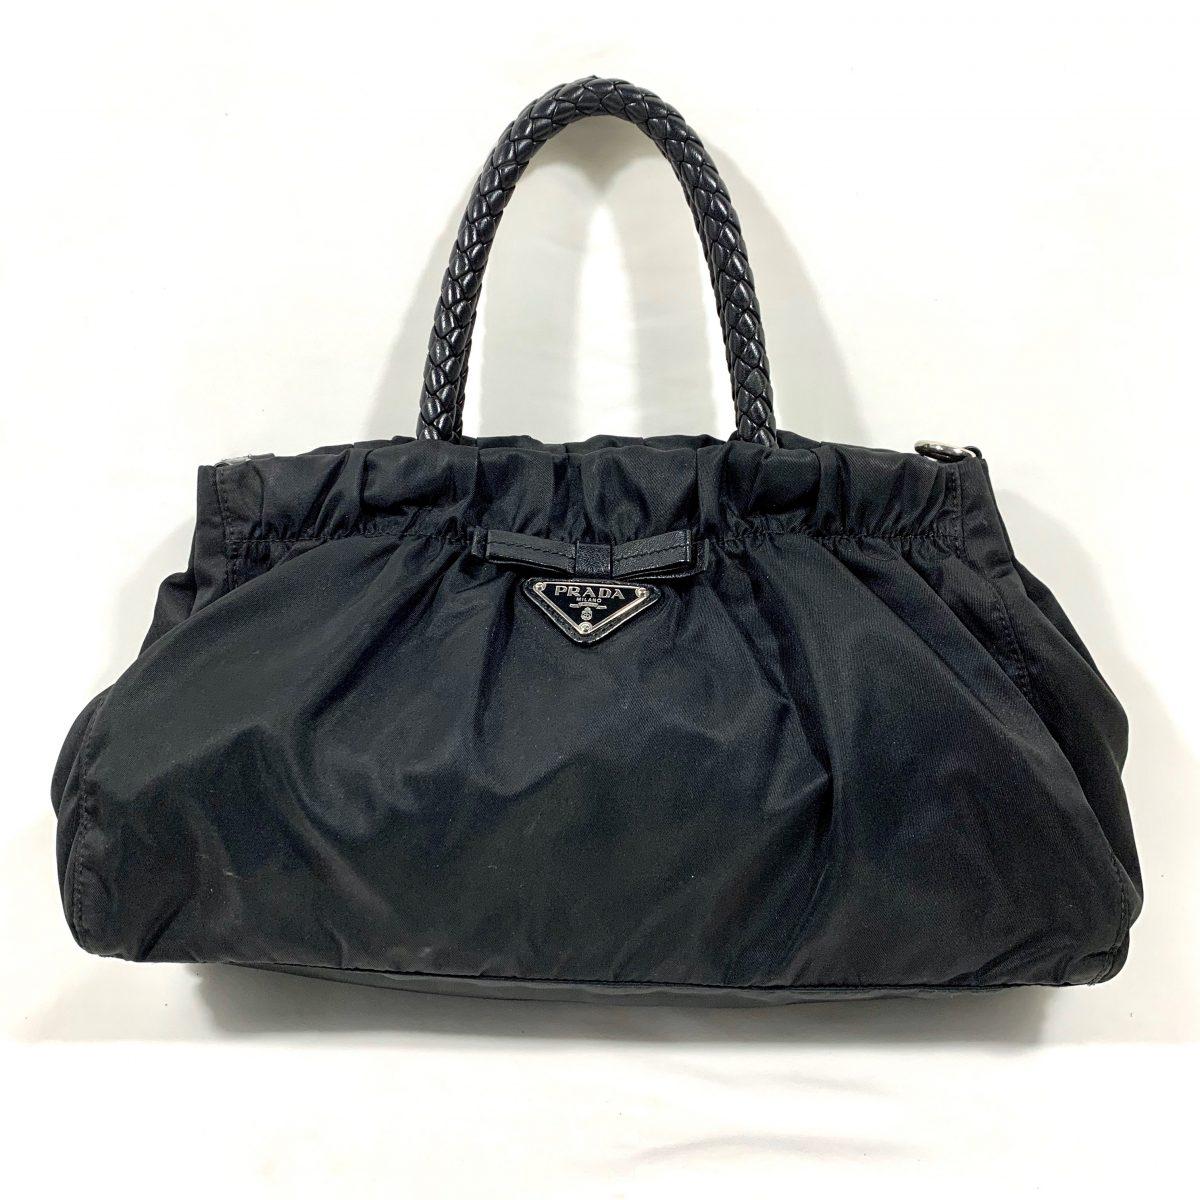 Prada designern nylon handbag